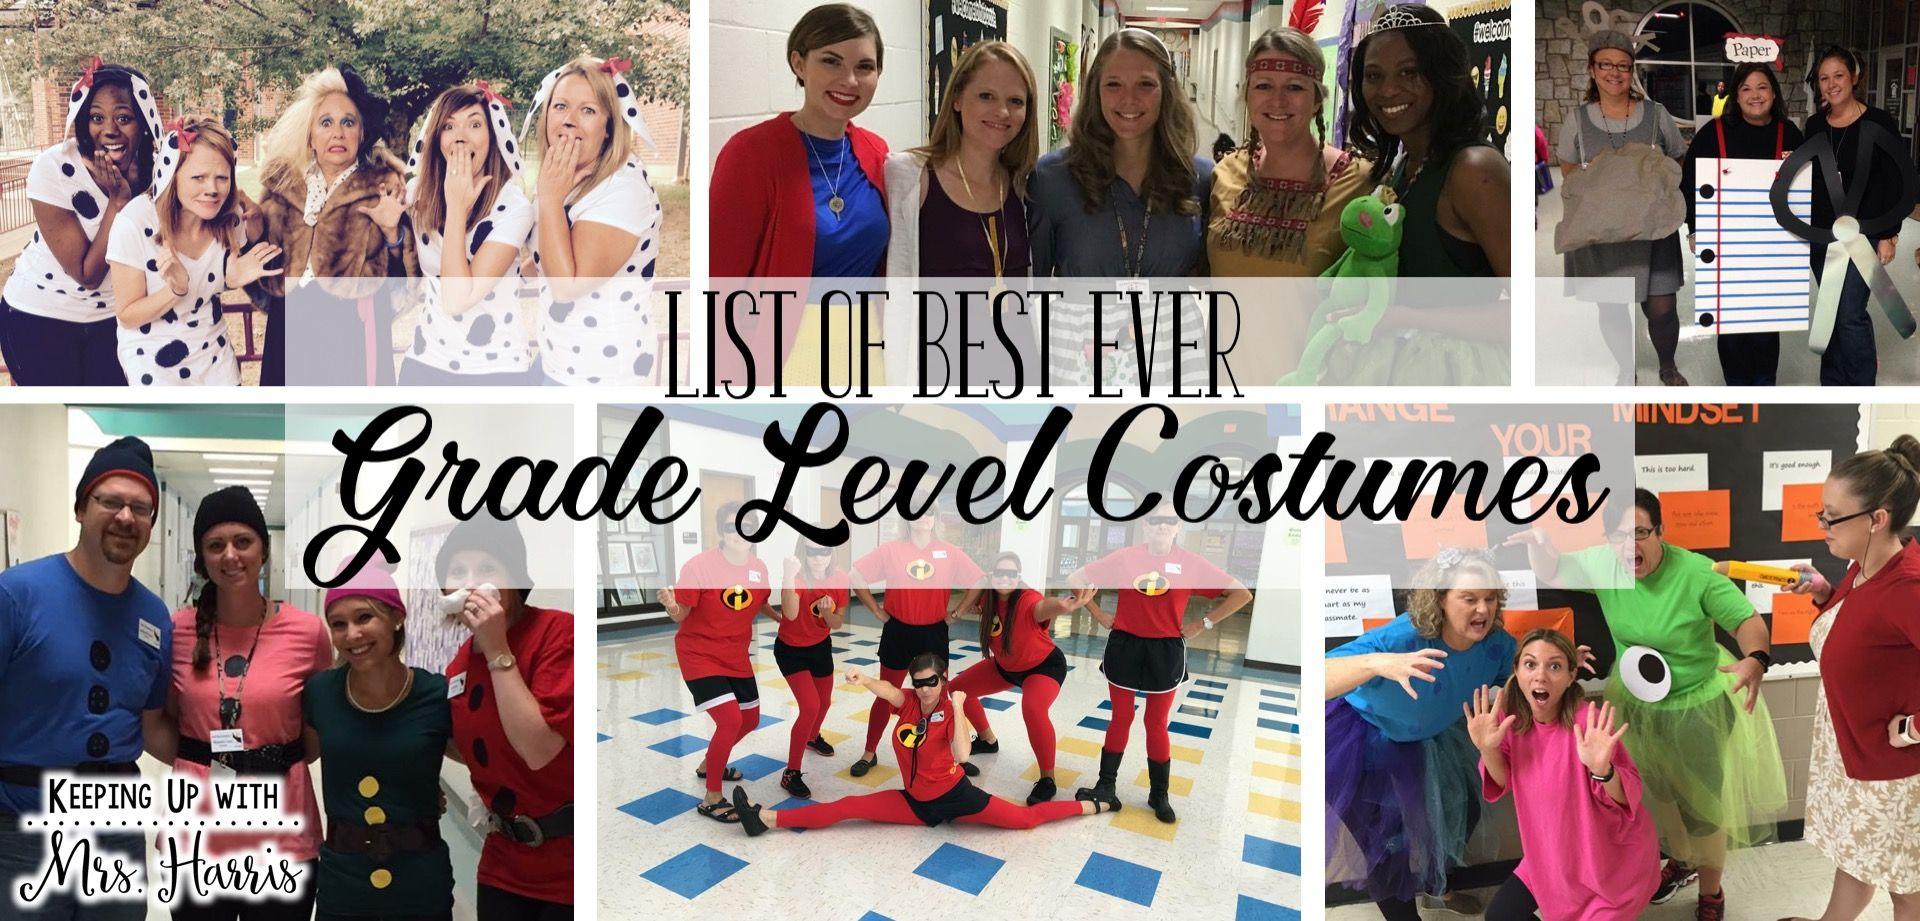 The Best Ever Grade Level Costumes For Teachers The Tpt Blog Book Character Day Teacher Costumes Spirit Week